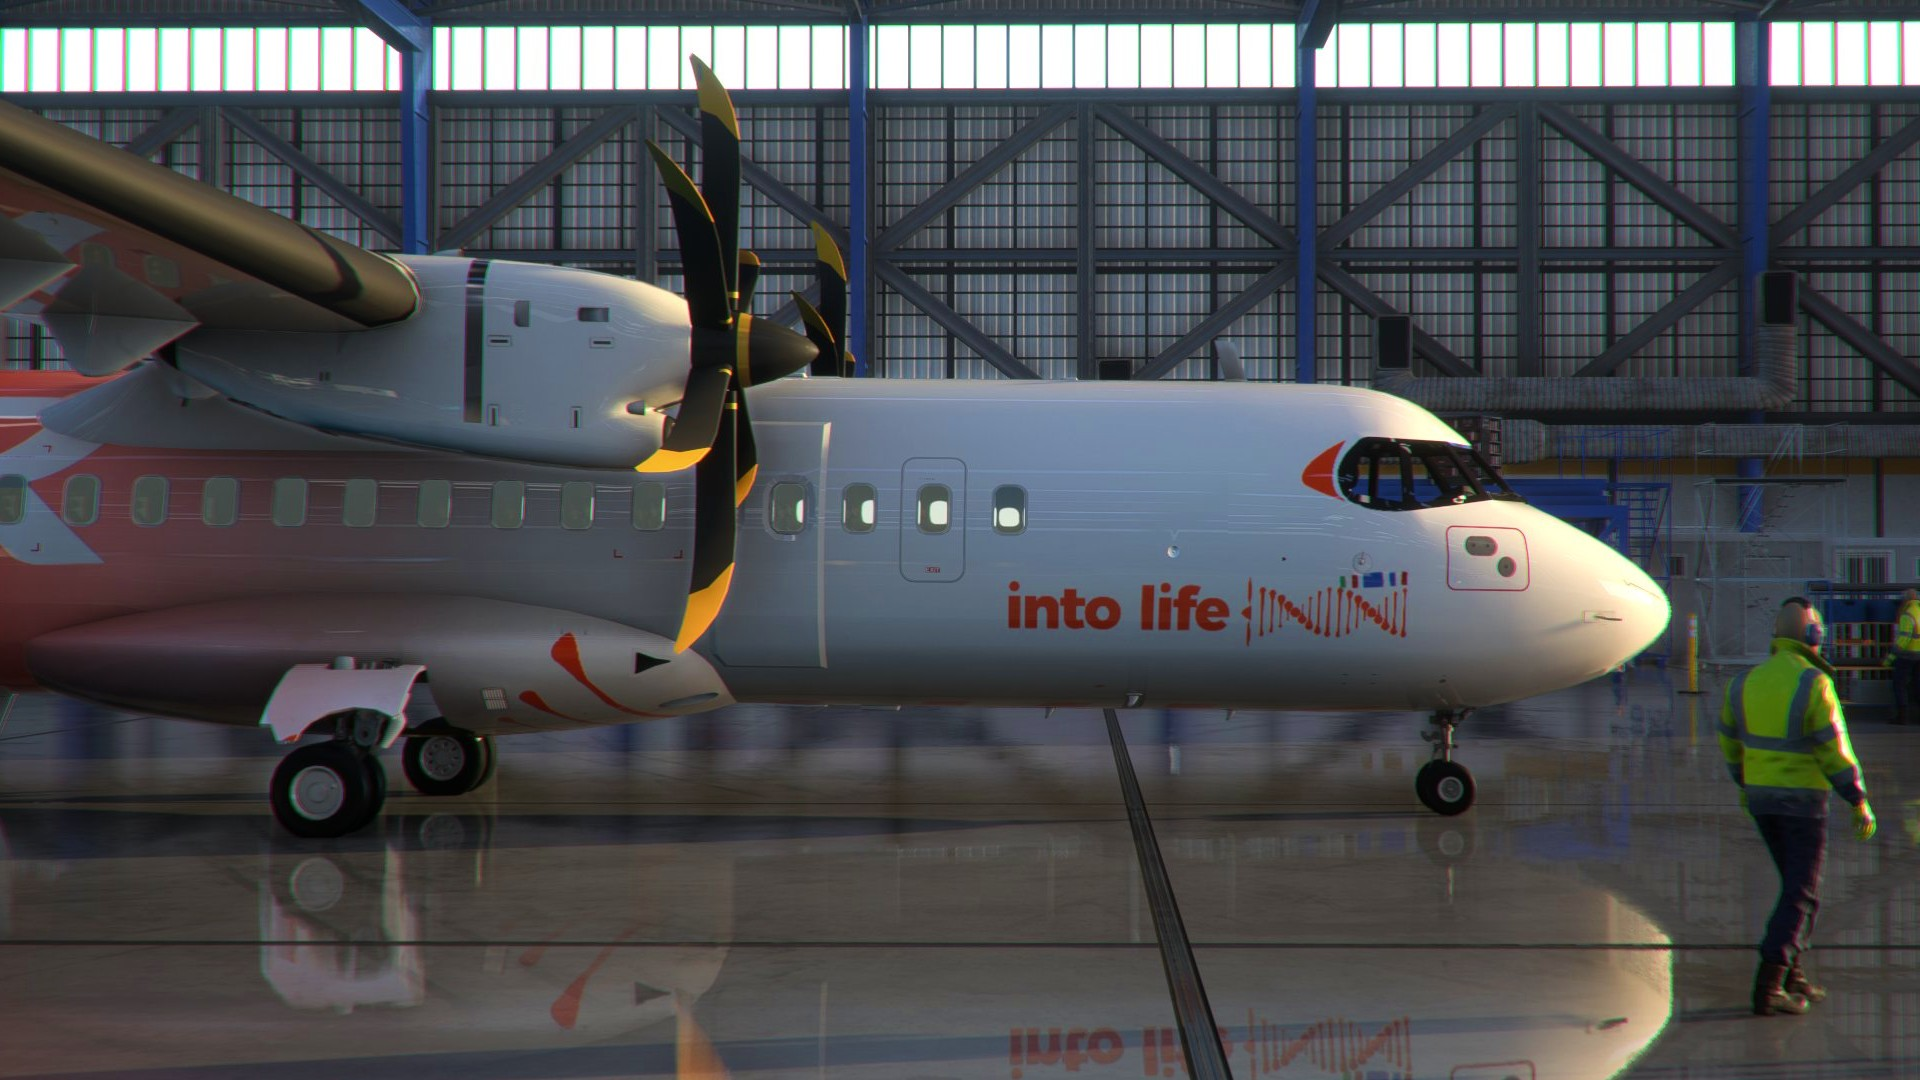 Microsoft Flight Simulator is getting the ATR 42-600 turboprop airliner in 2022